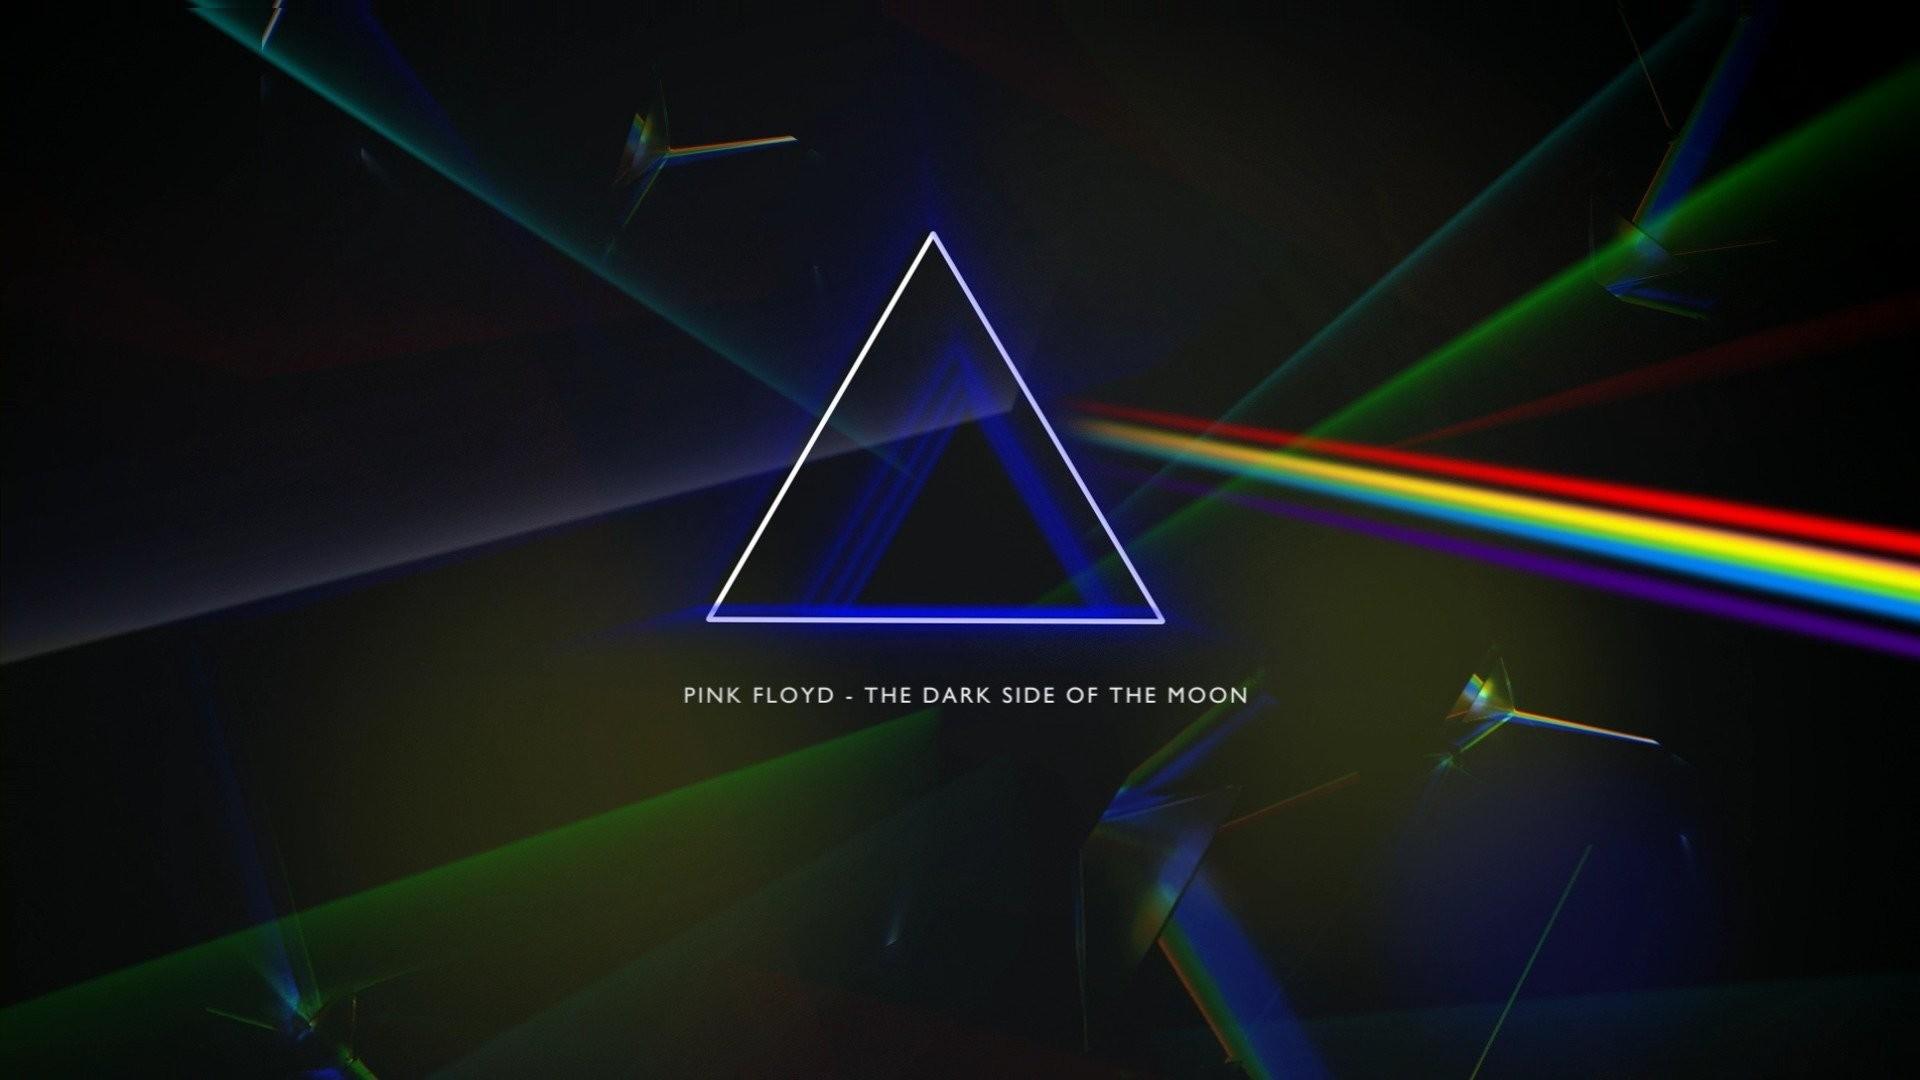 Pink Floyd Dark Side Of The Moon Album Cover Wallpaper